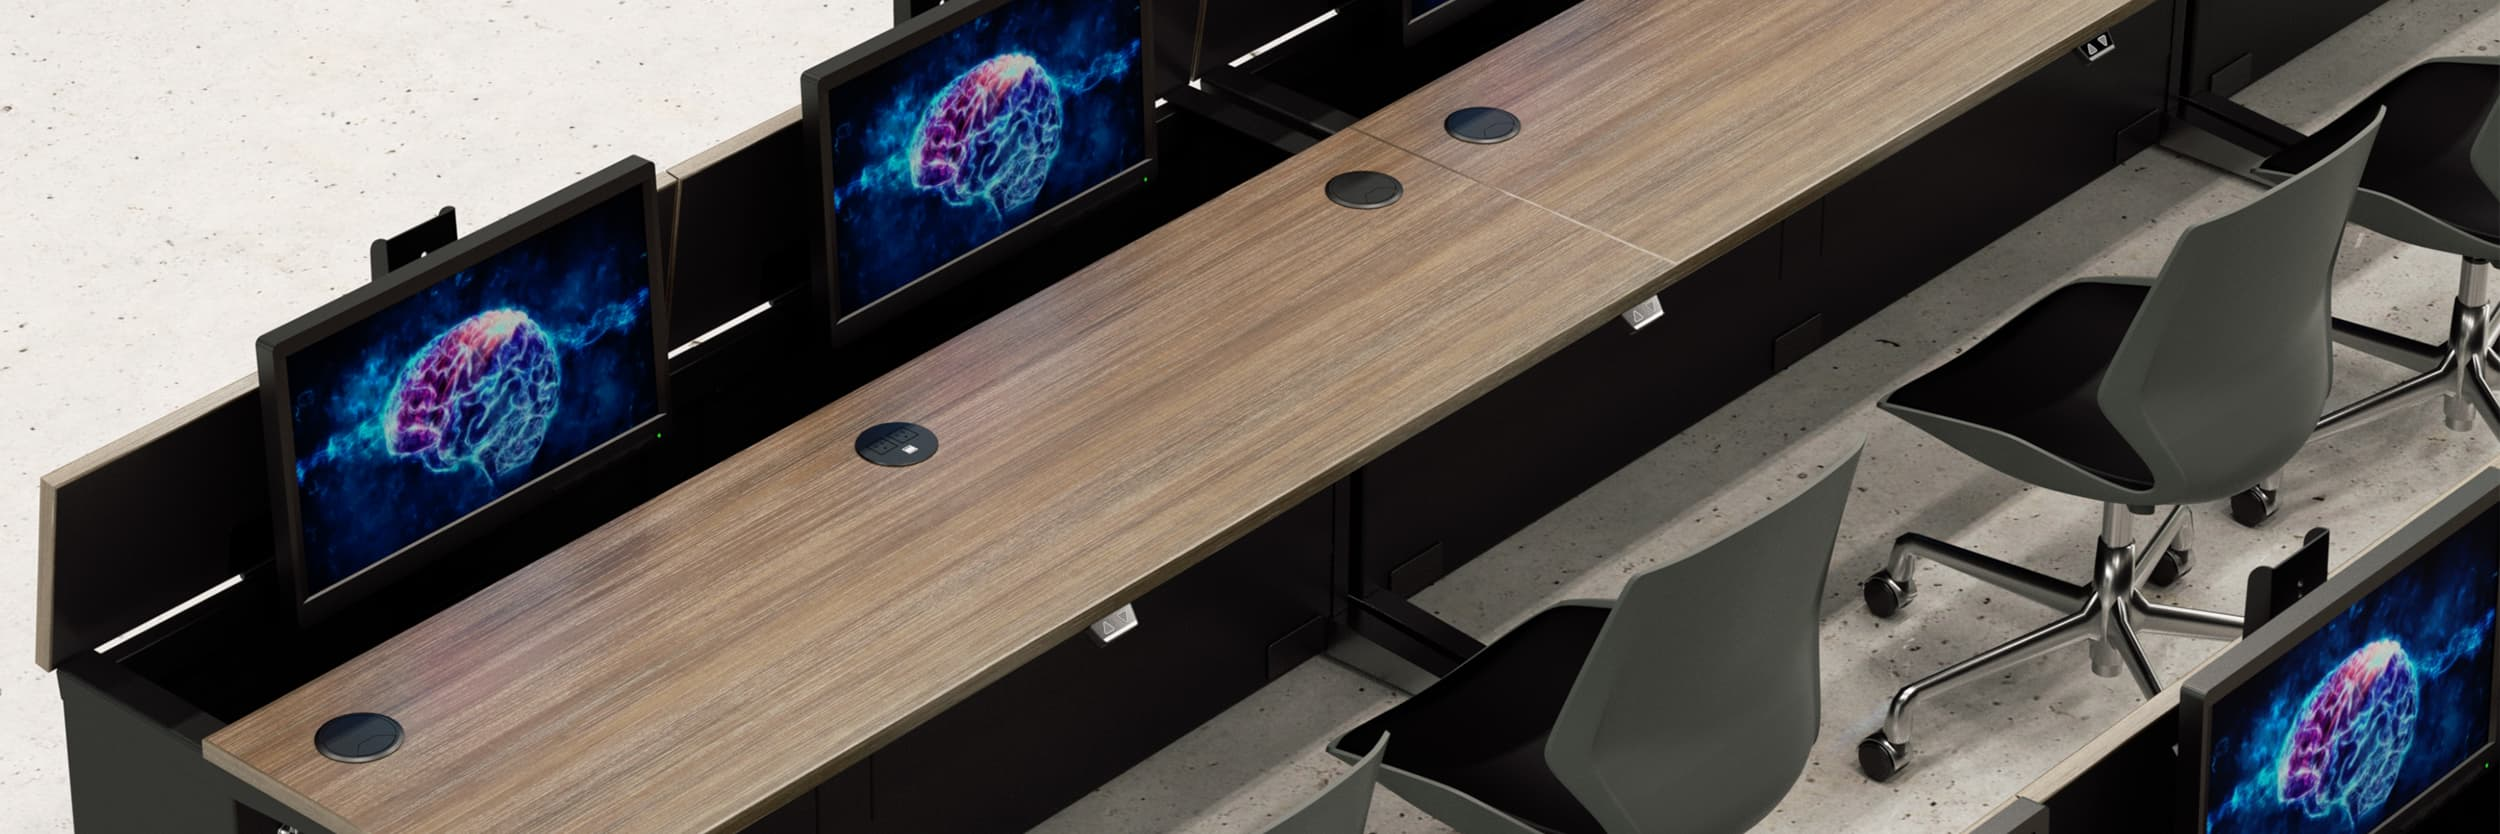 computer-training-desks